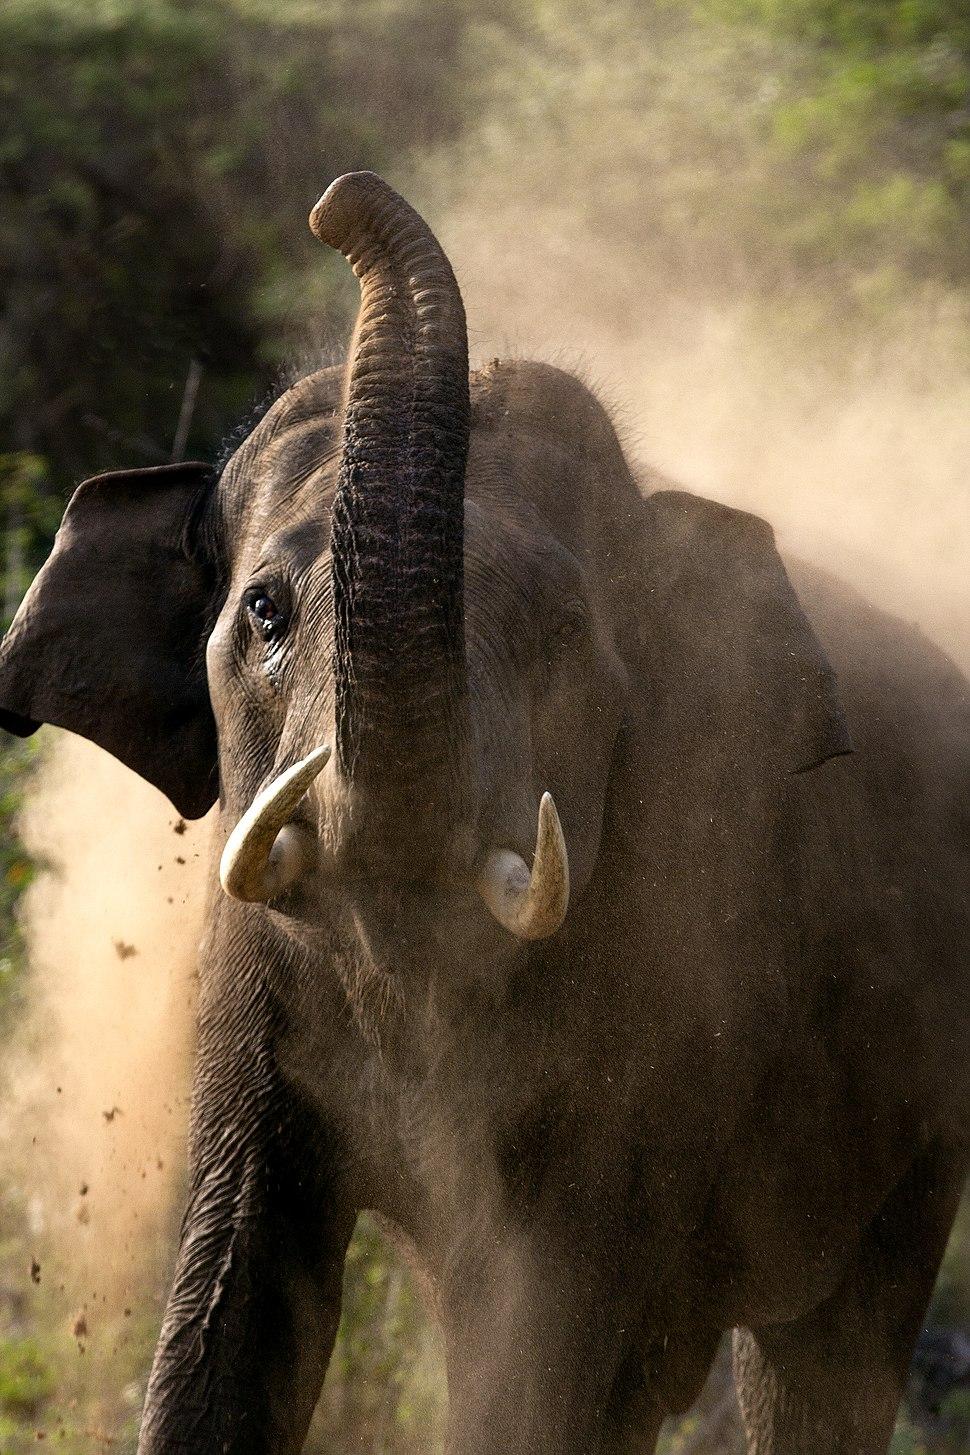 Kerala Elephant 0170 by N A Nazeer 03